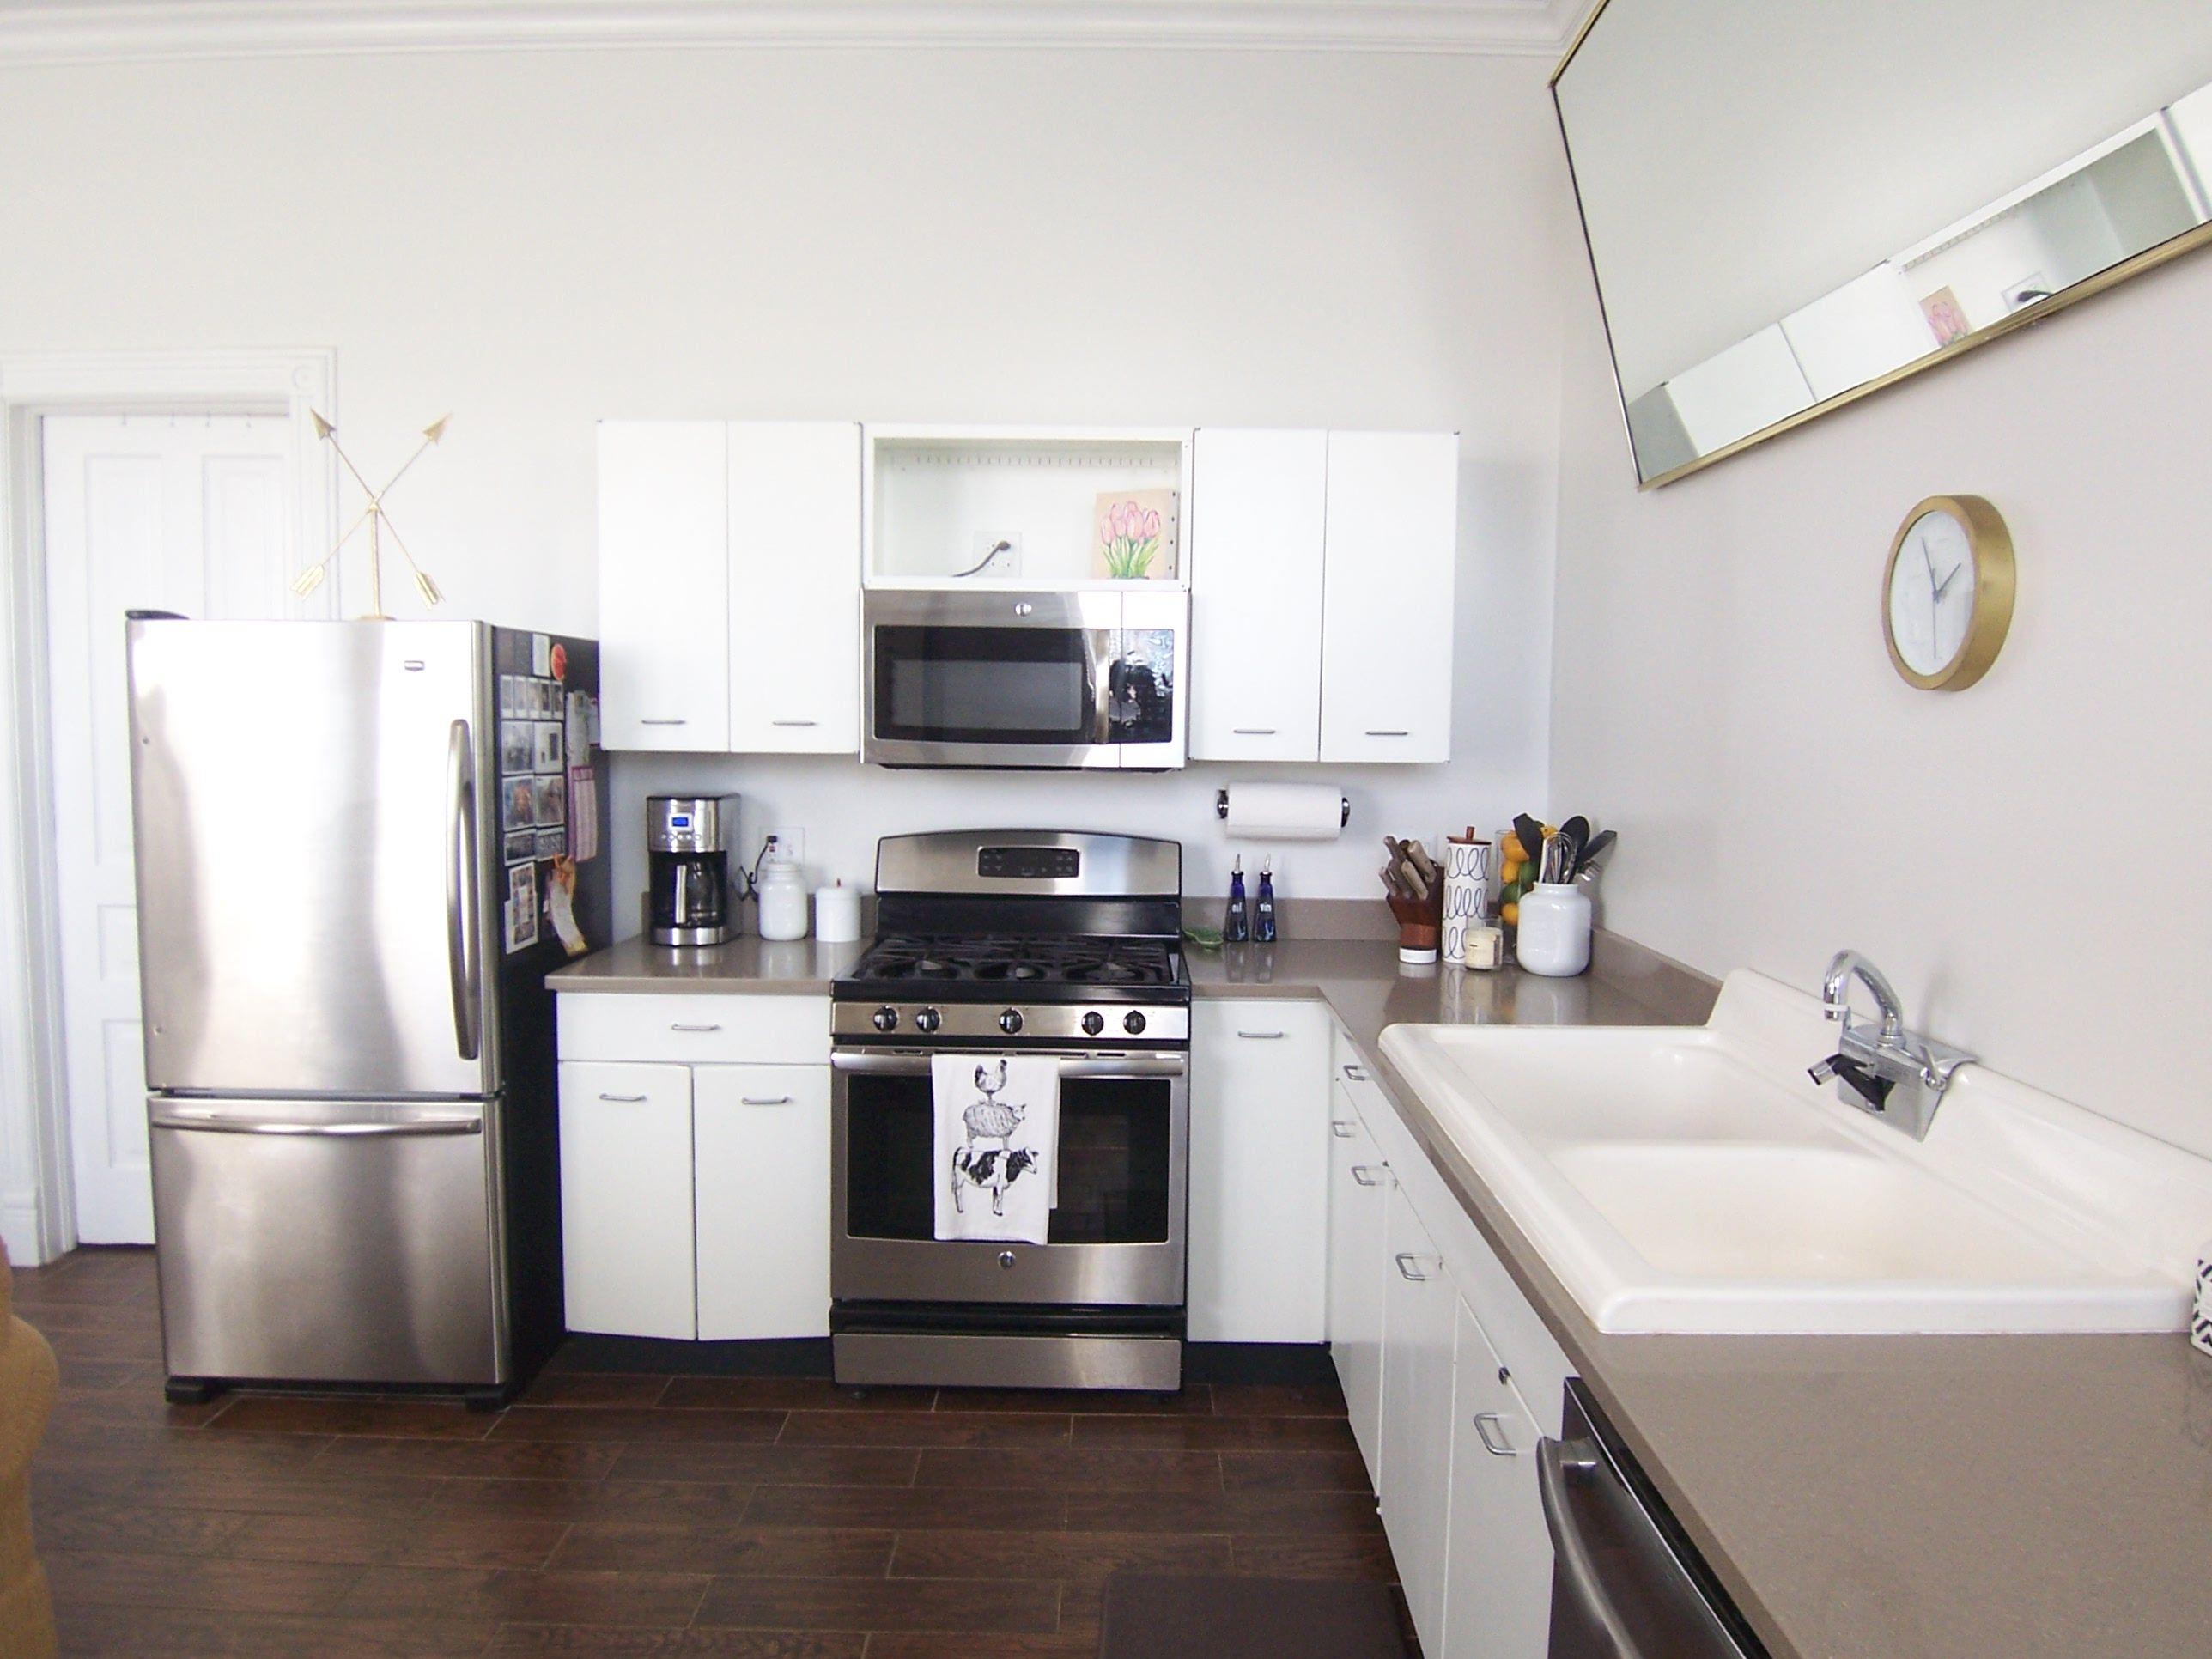 Modern White Kitchen In Lincoln Park Chicago With Grey Quartz Countertops White Cabinet White Modern Kitchen White Kitchen Remodeling White Tile Kitchen Floor